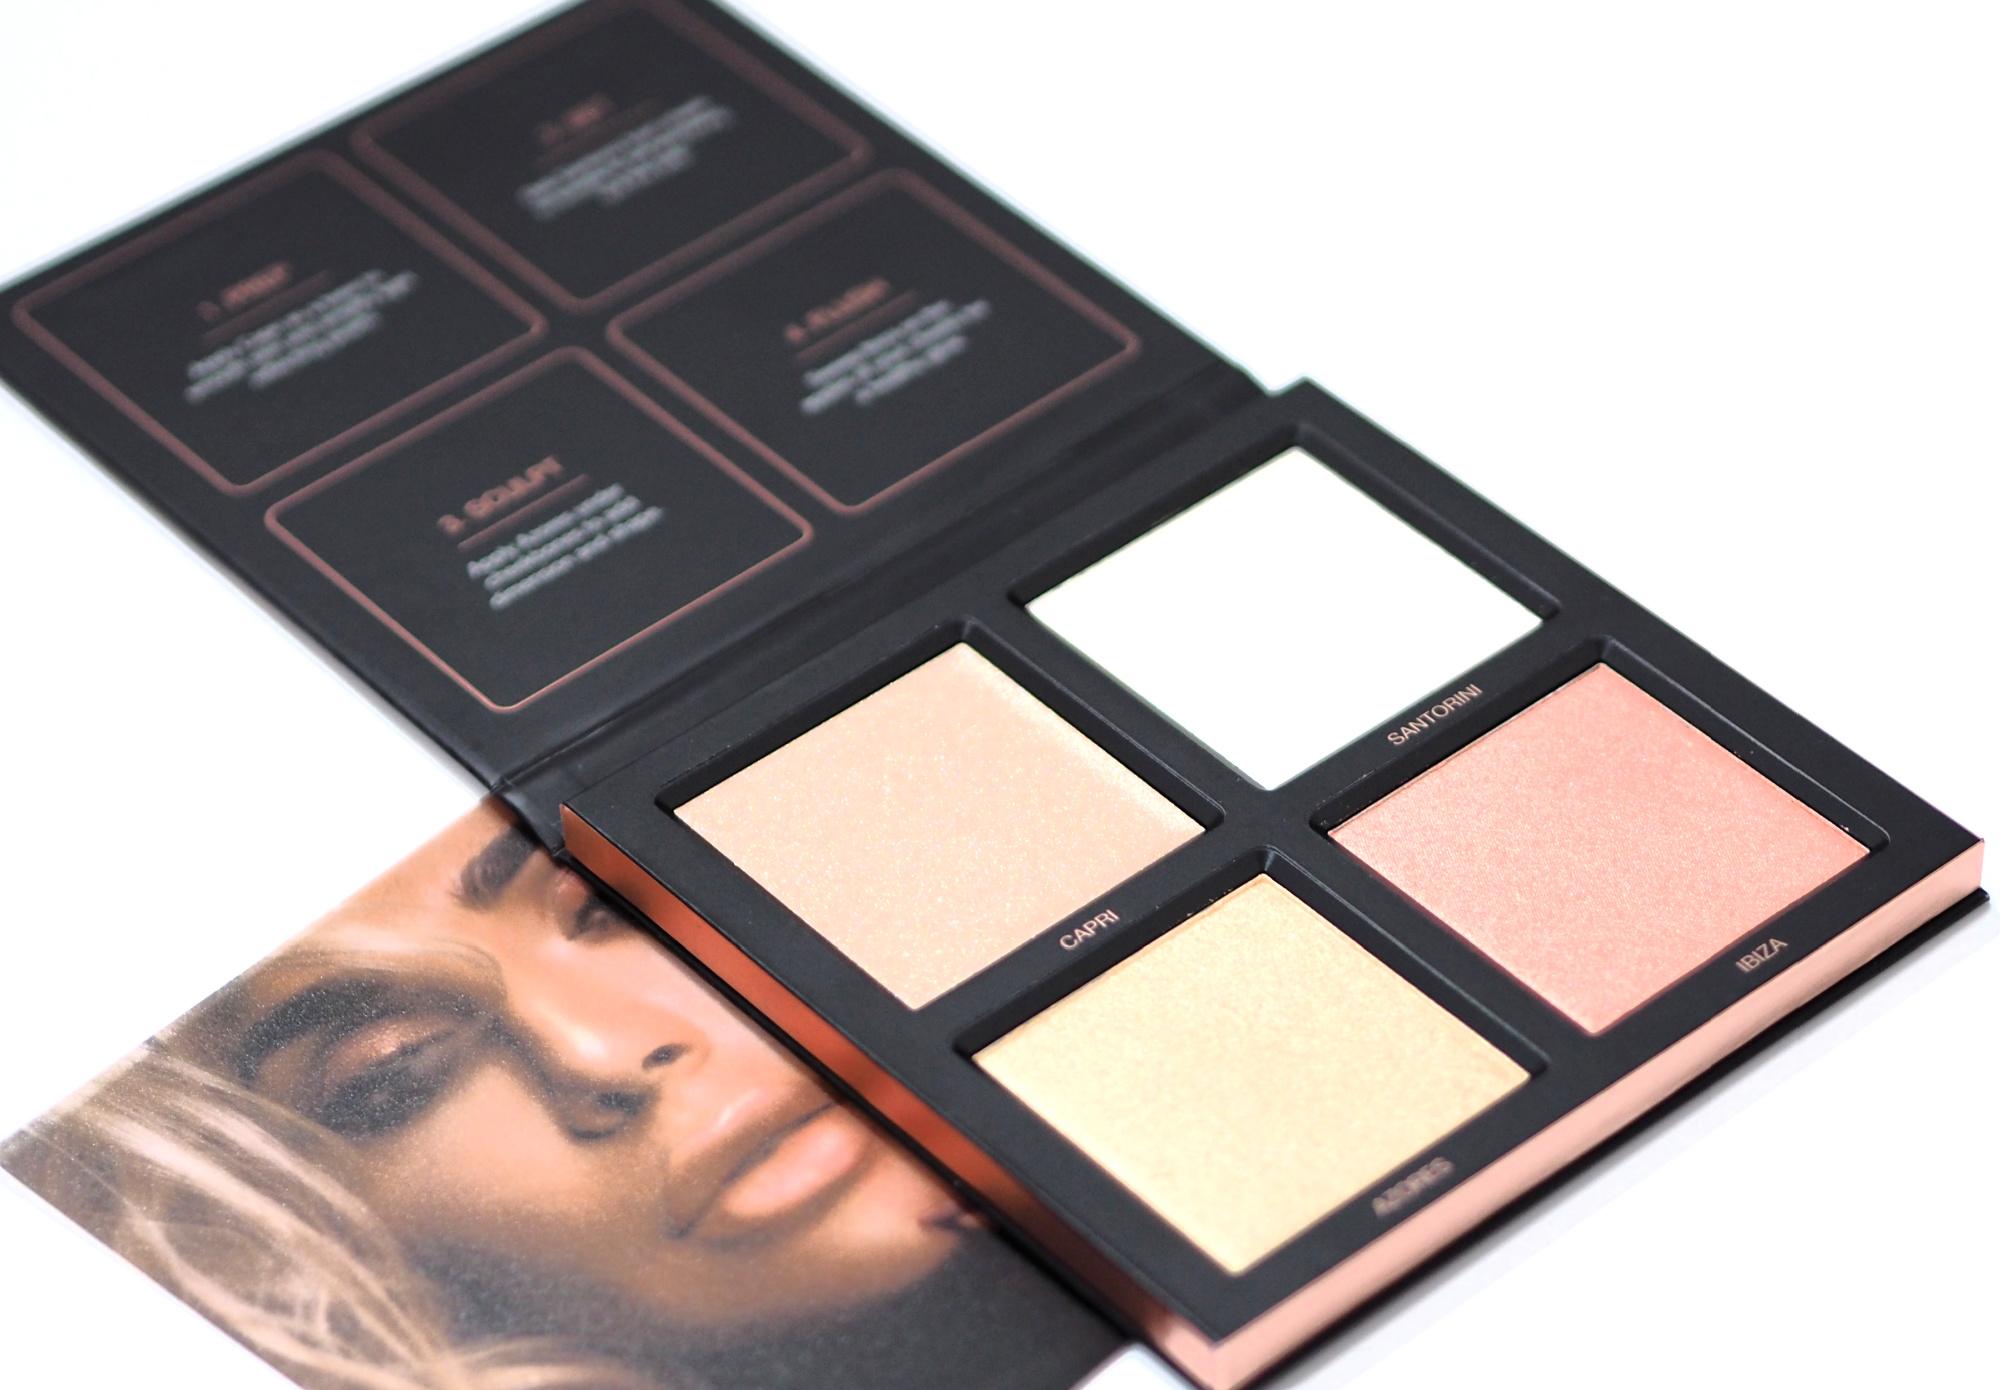 Huda Beauty Pink Sands 3D Highlighter Palette